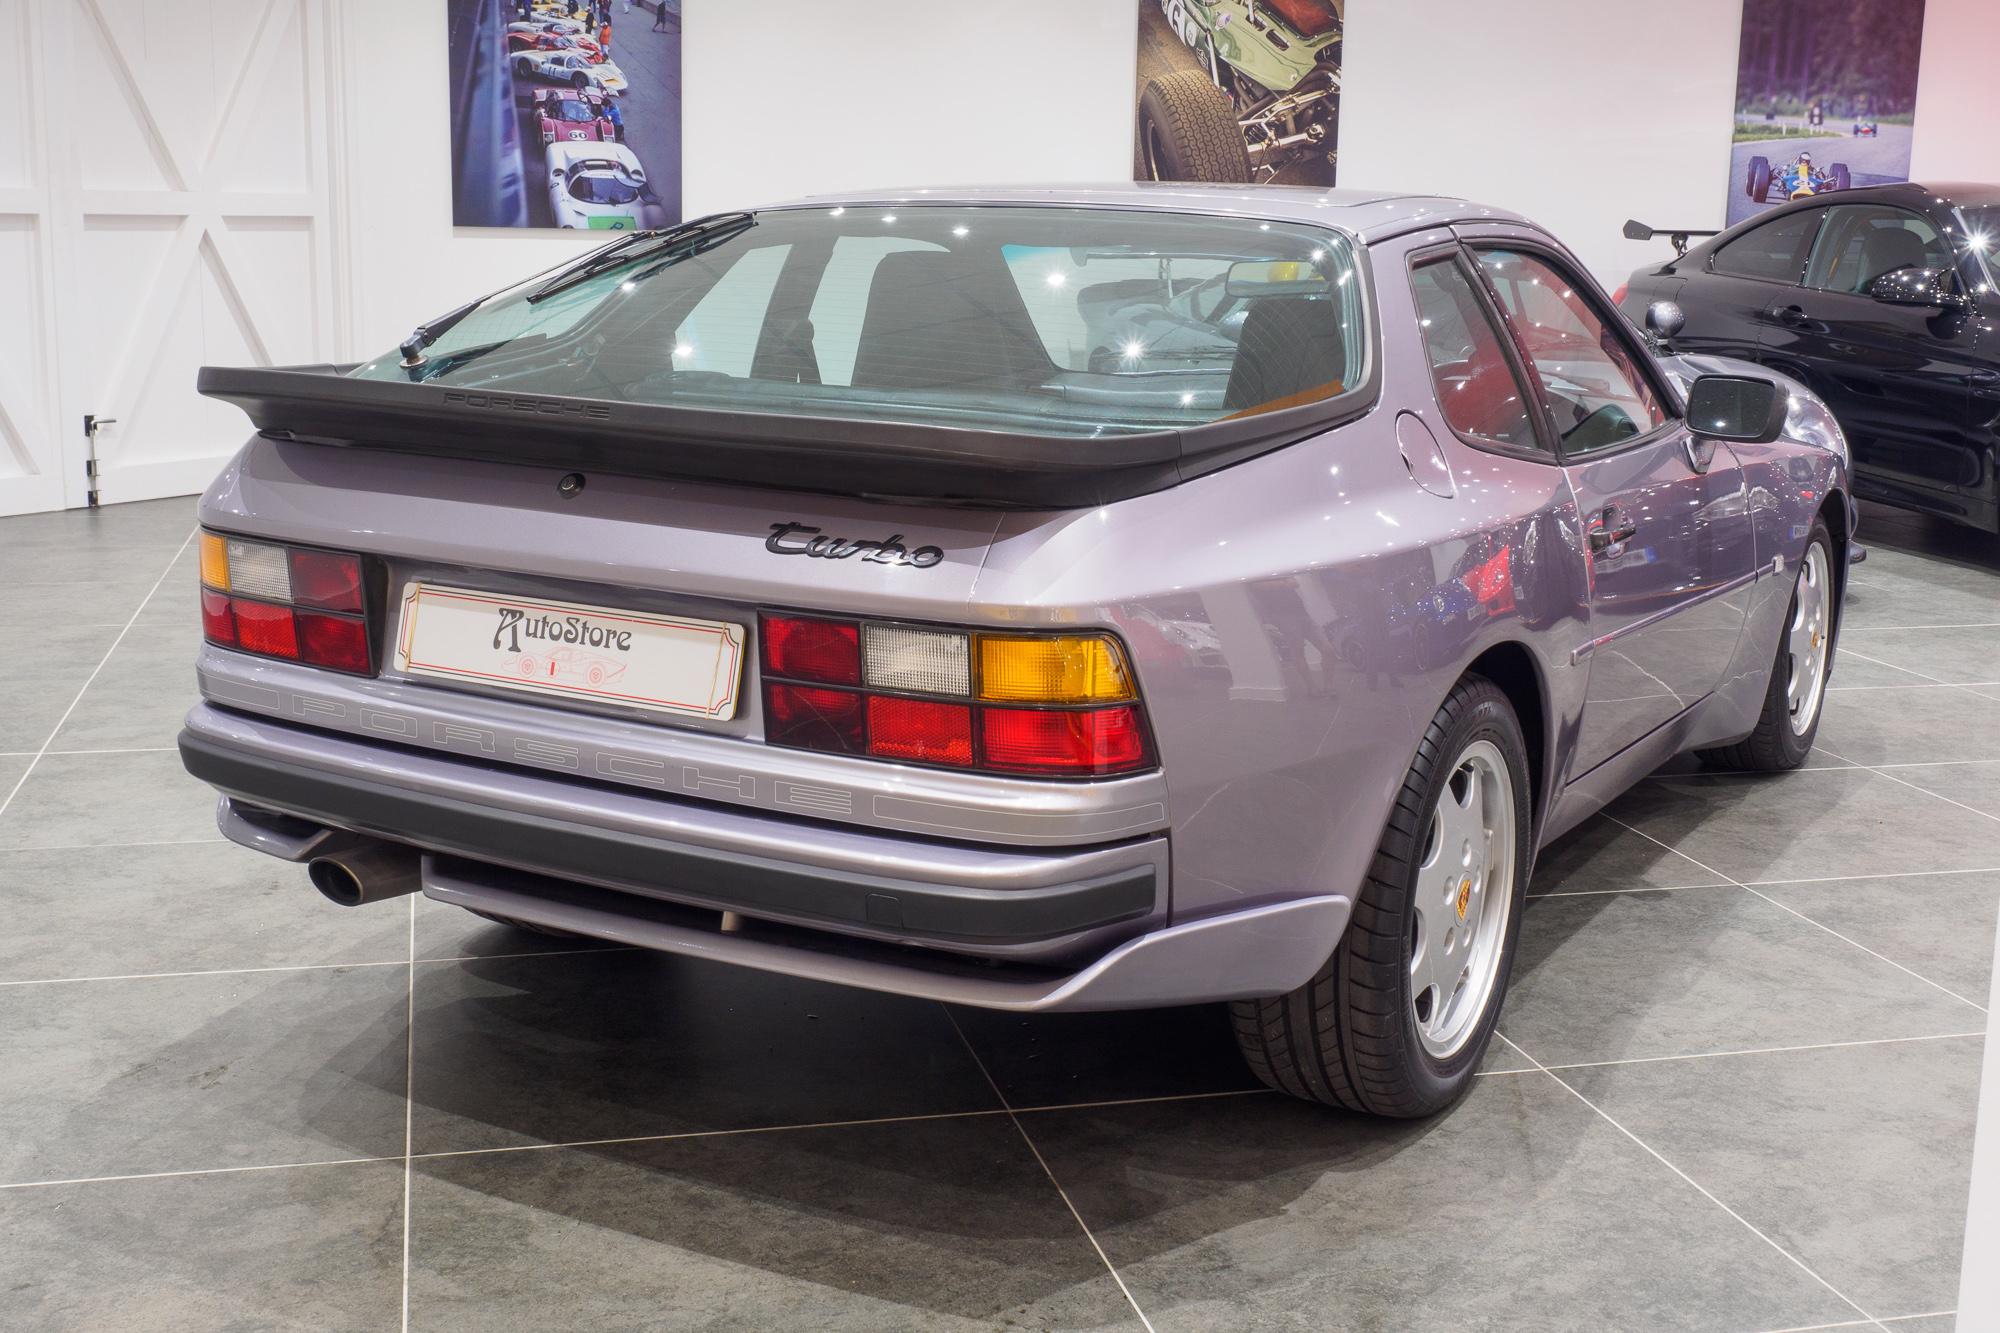 Autostore Sales Porsche 944 Turbo